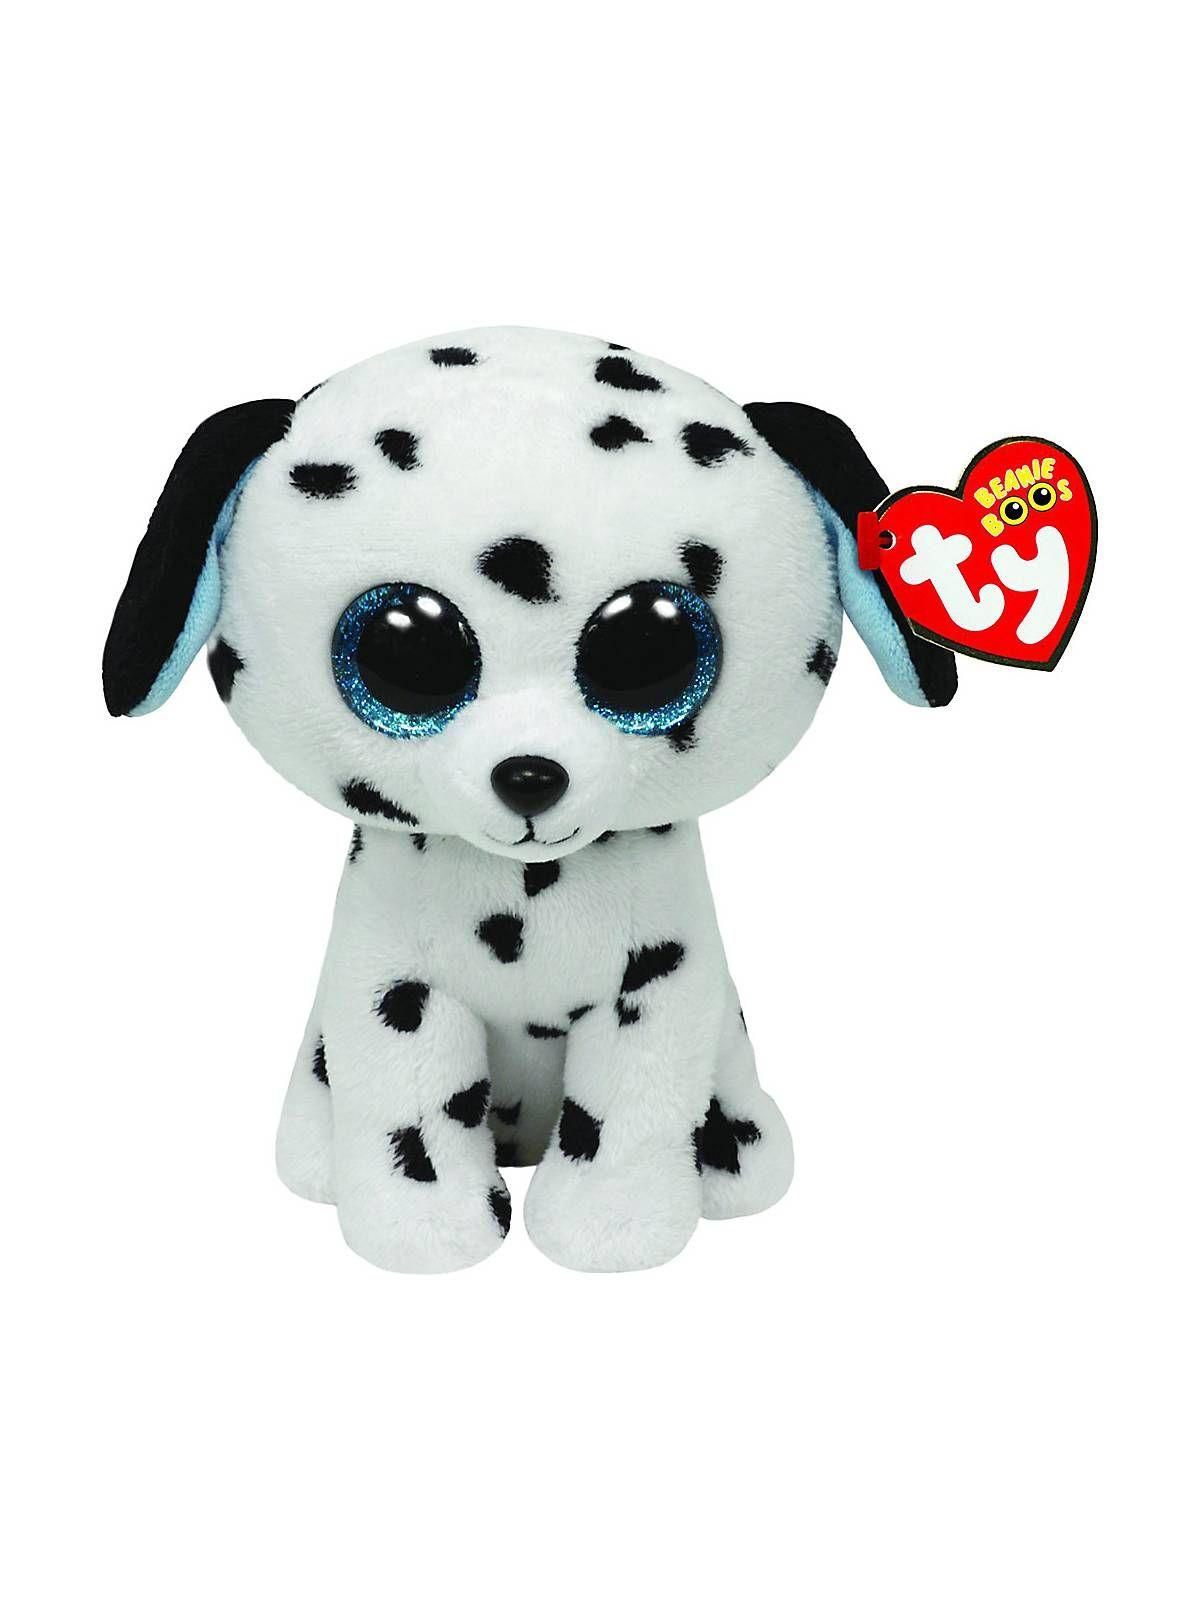 "Fetch the Dalmatian 13"" TY Beanie Boo Wholesale"